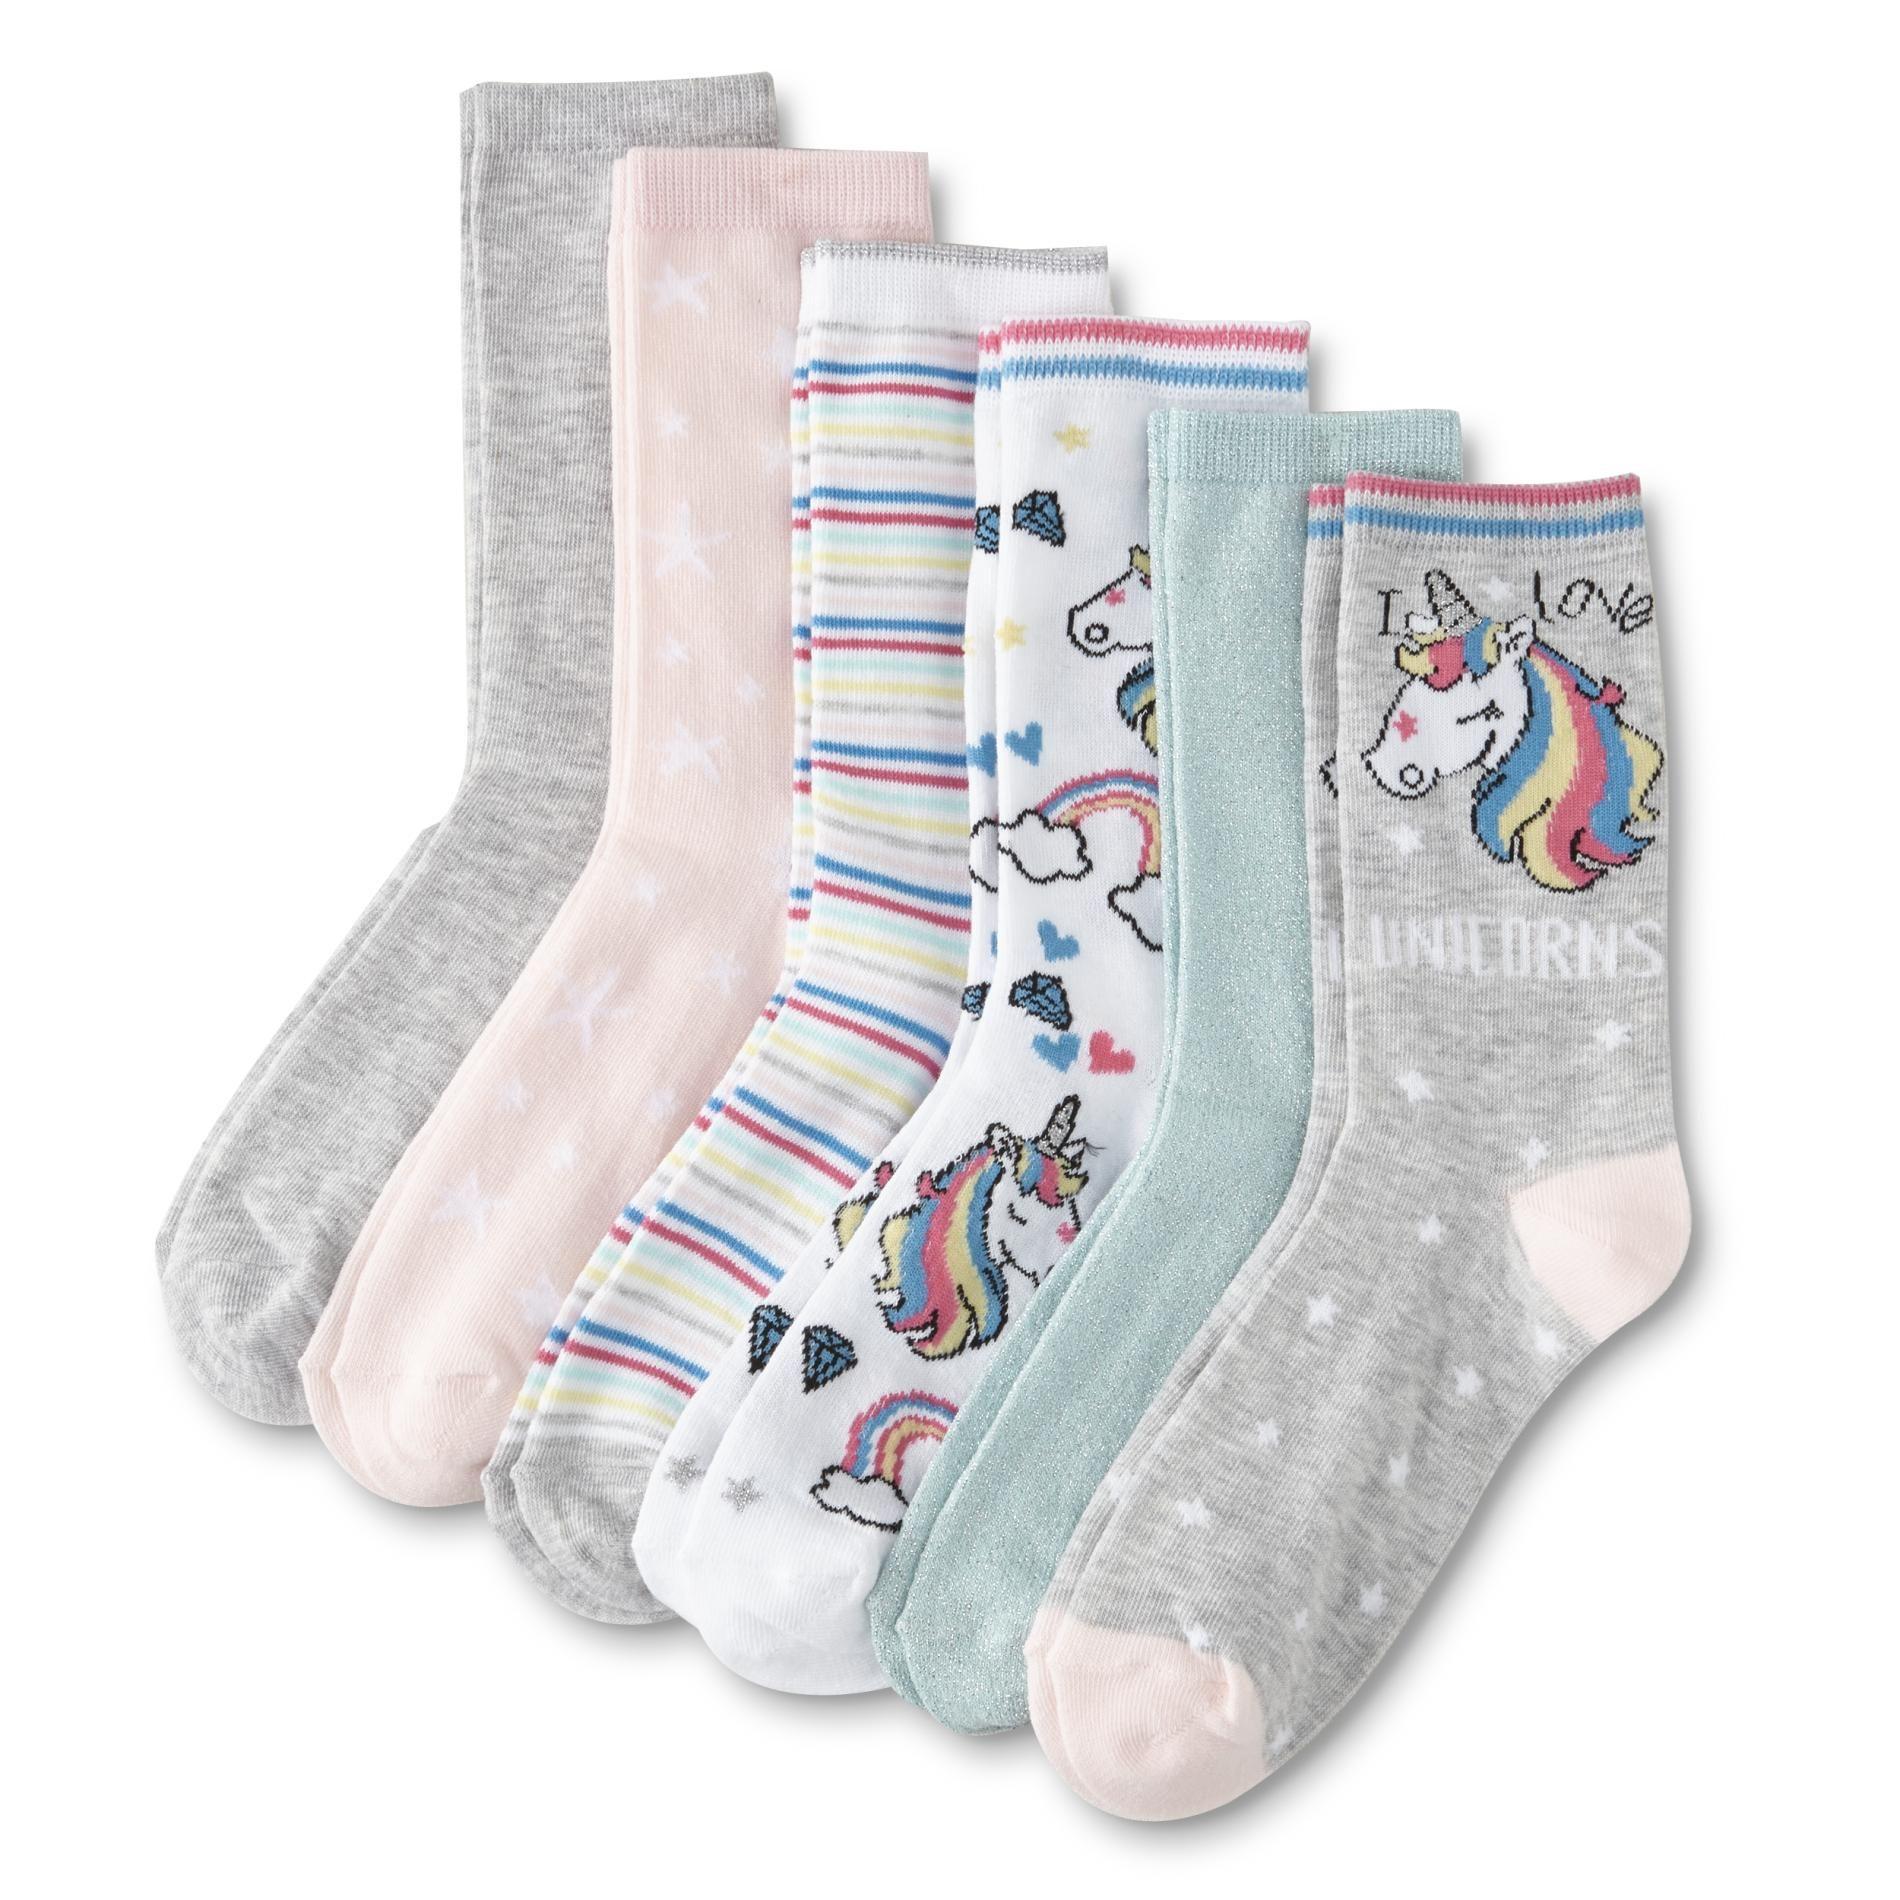 Ladies UK Size 4-6 - Multicoloured 5 Pairs Ladies High Performance Thermal Ski Socks EU 37-39